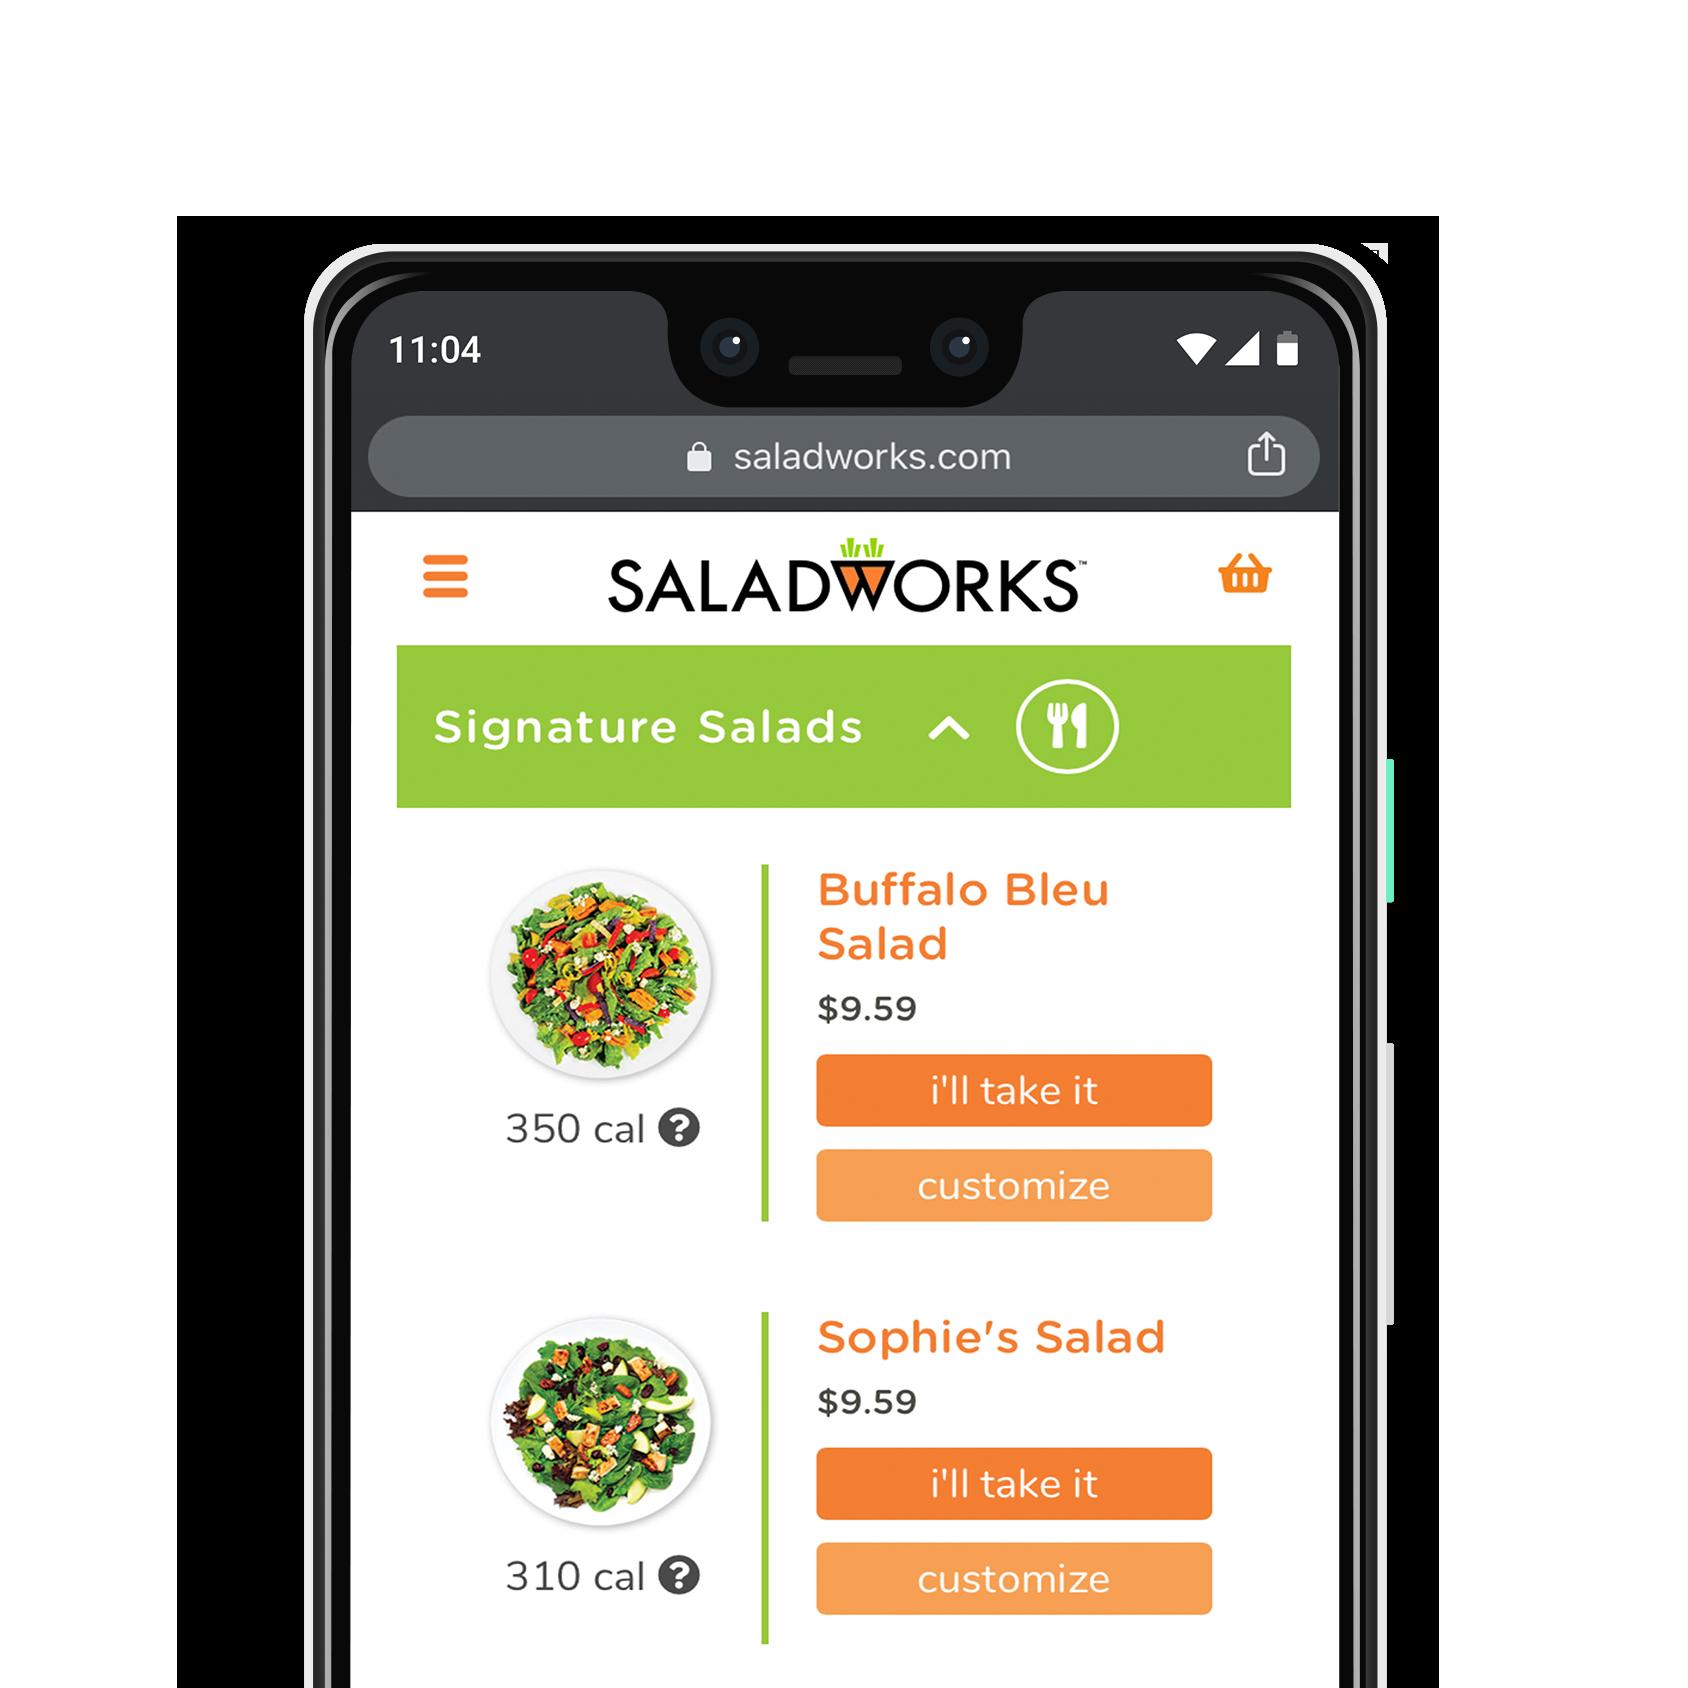 Saladworks menu on google pixel 3 XL